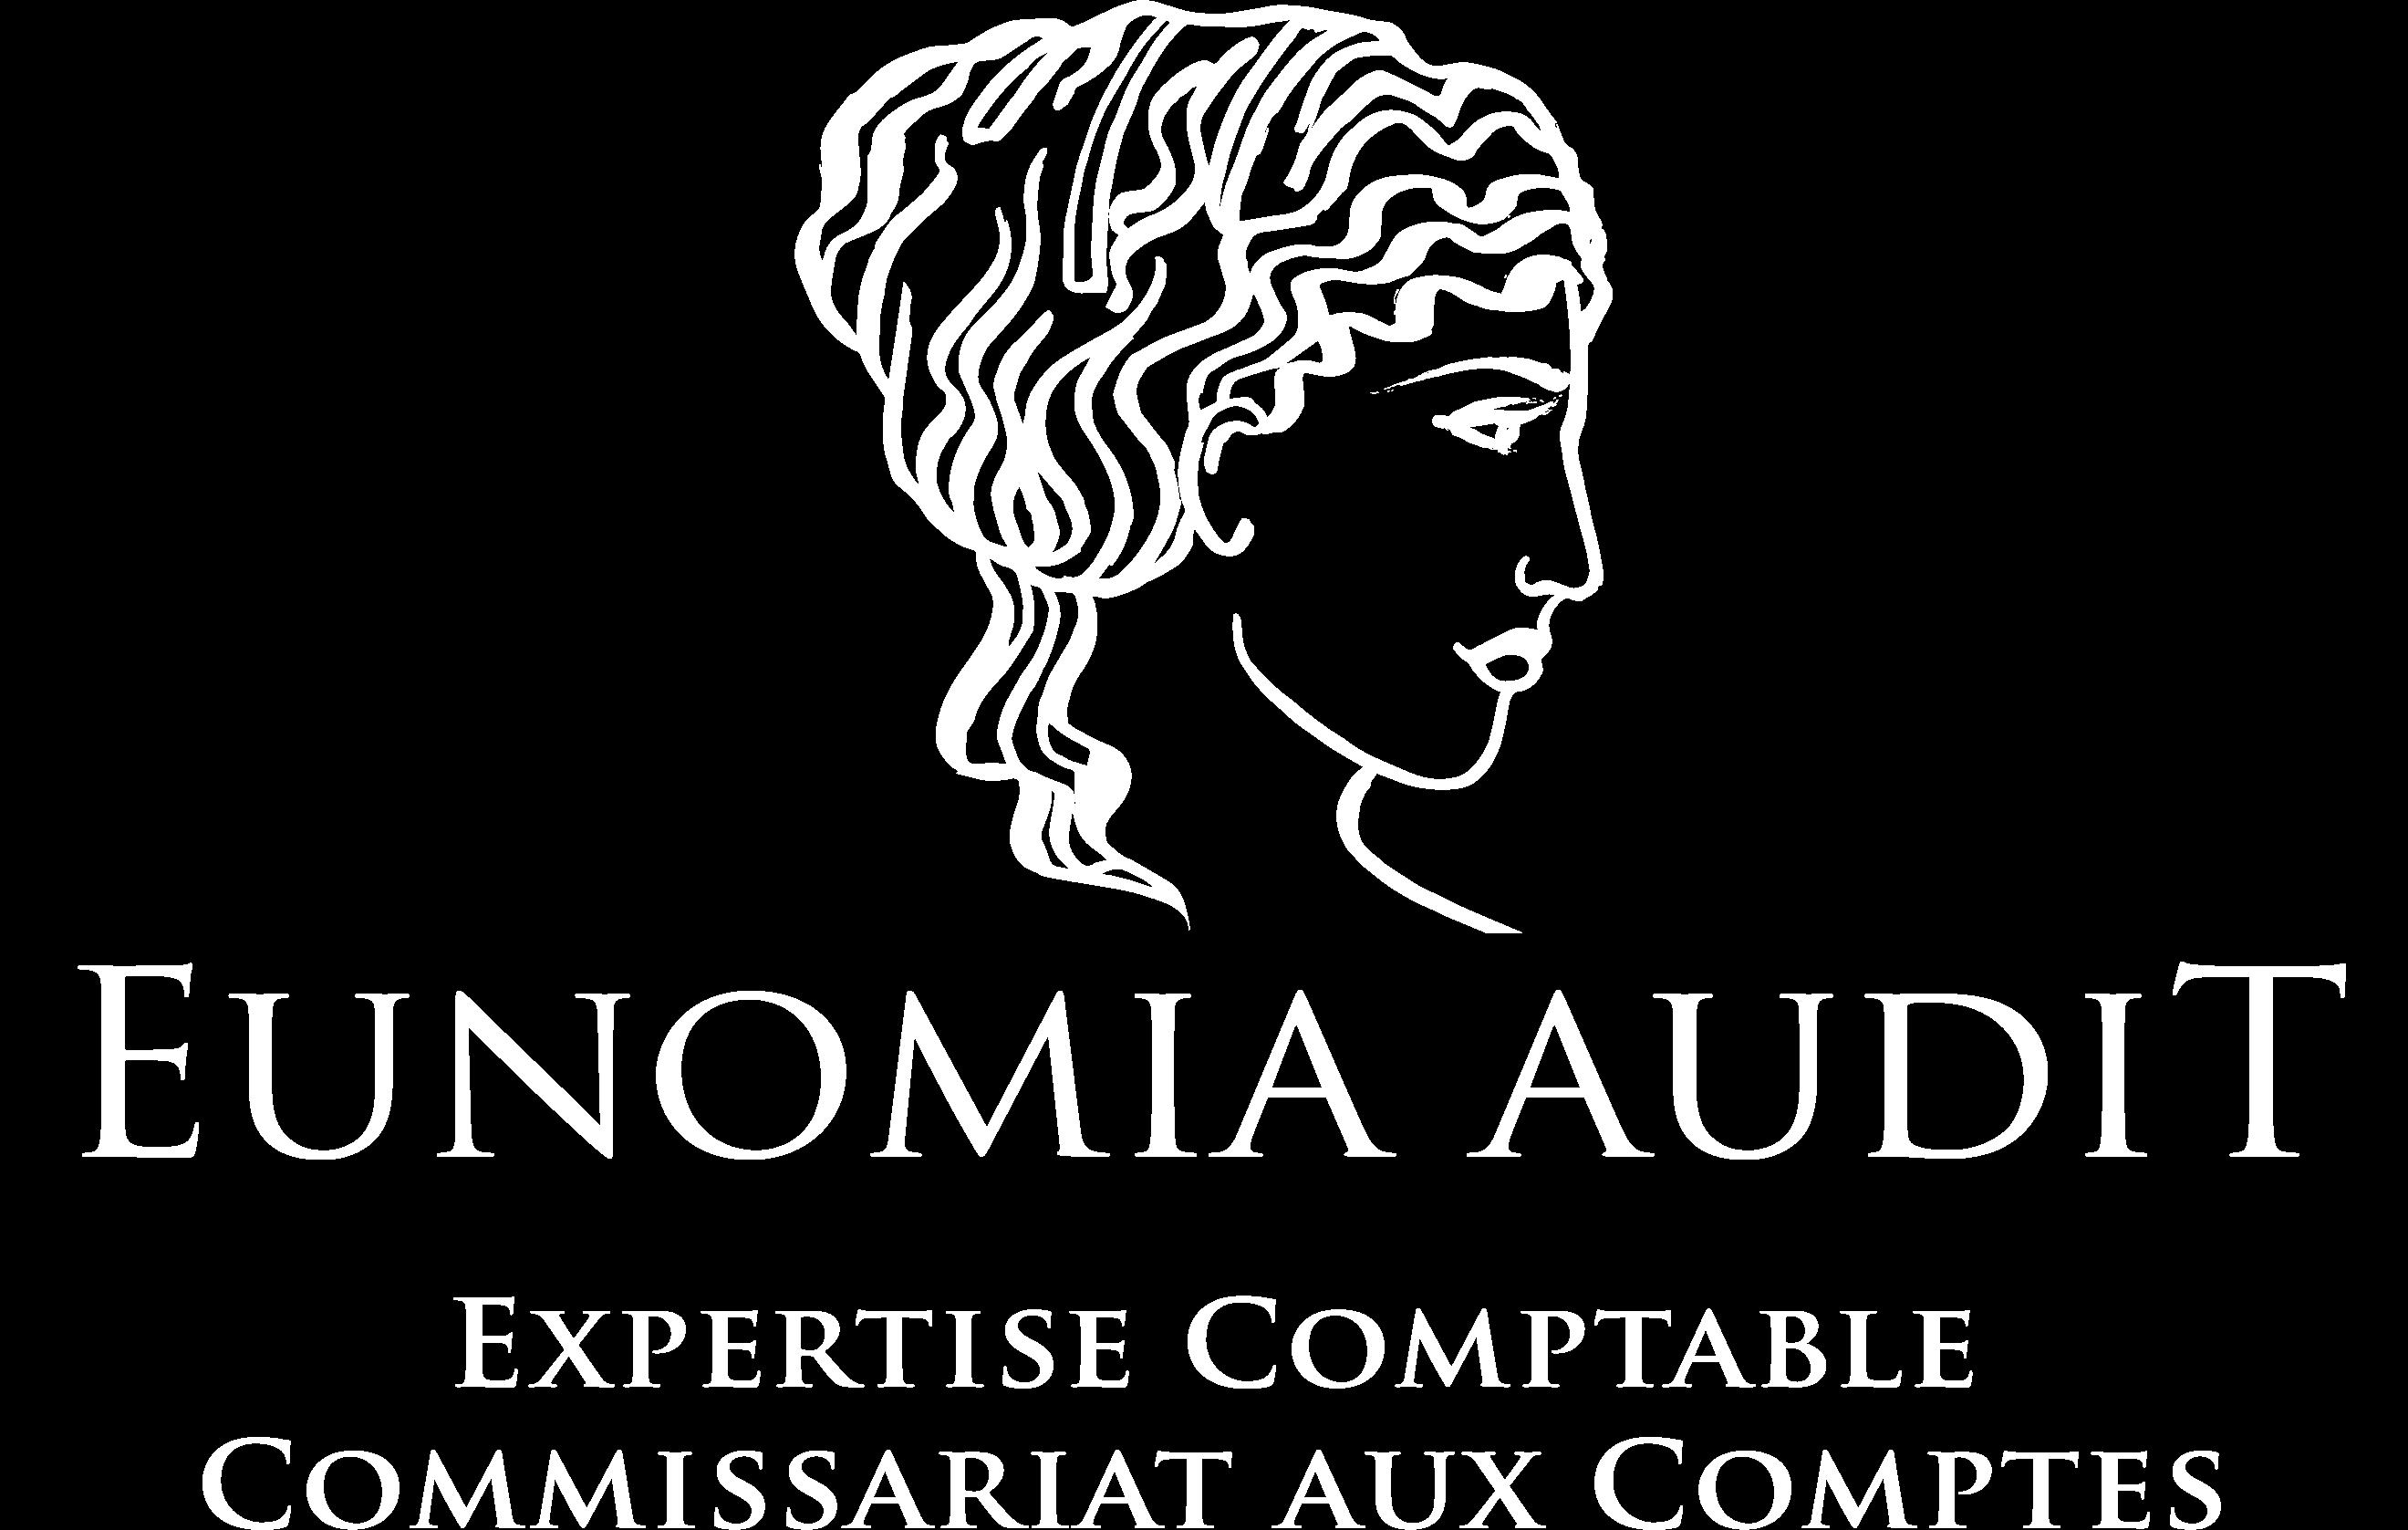 Expertise comptable & Commissariat aux Comptes